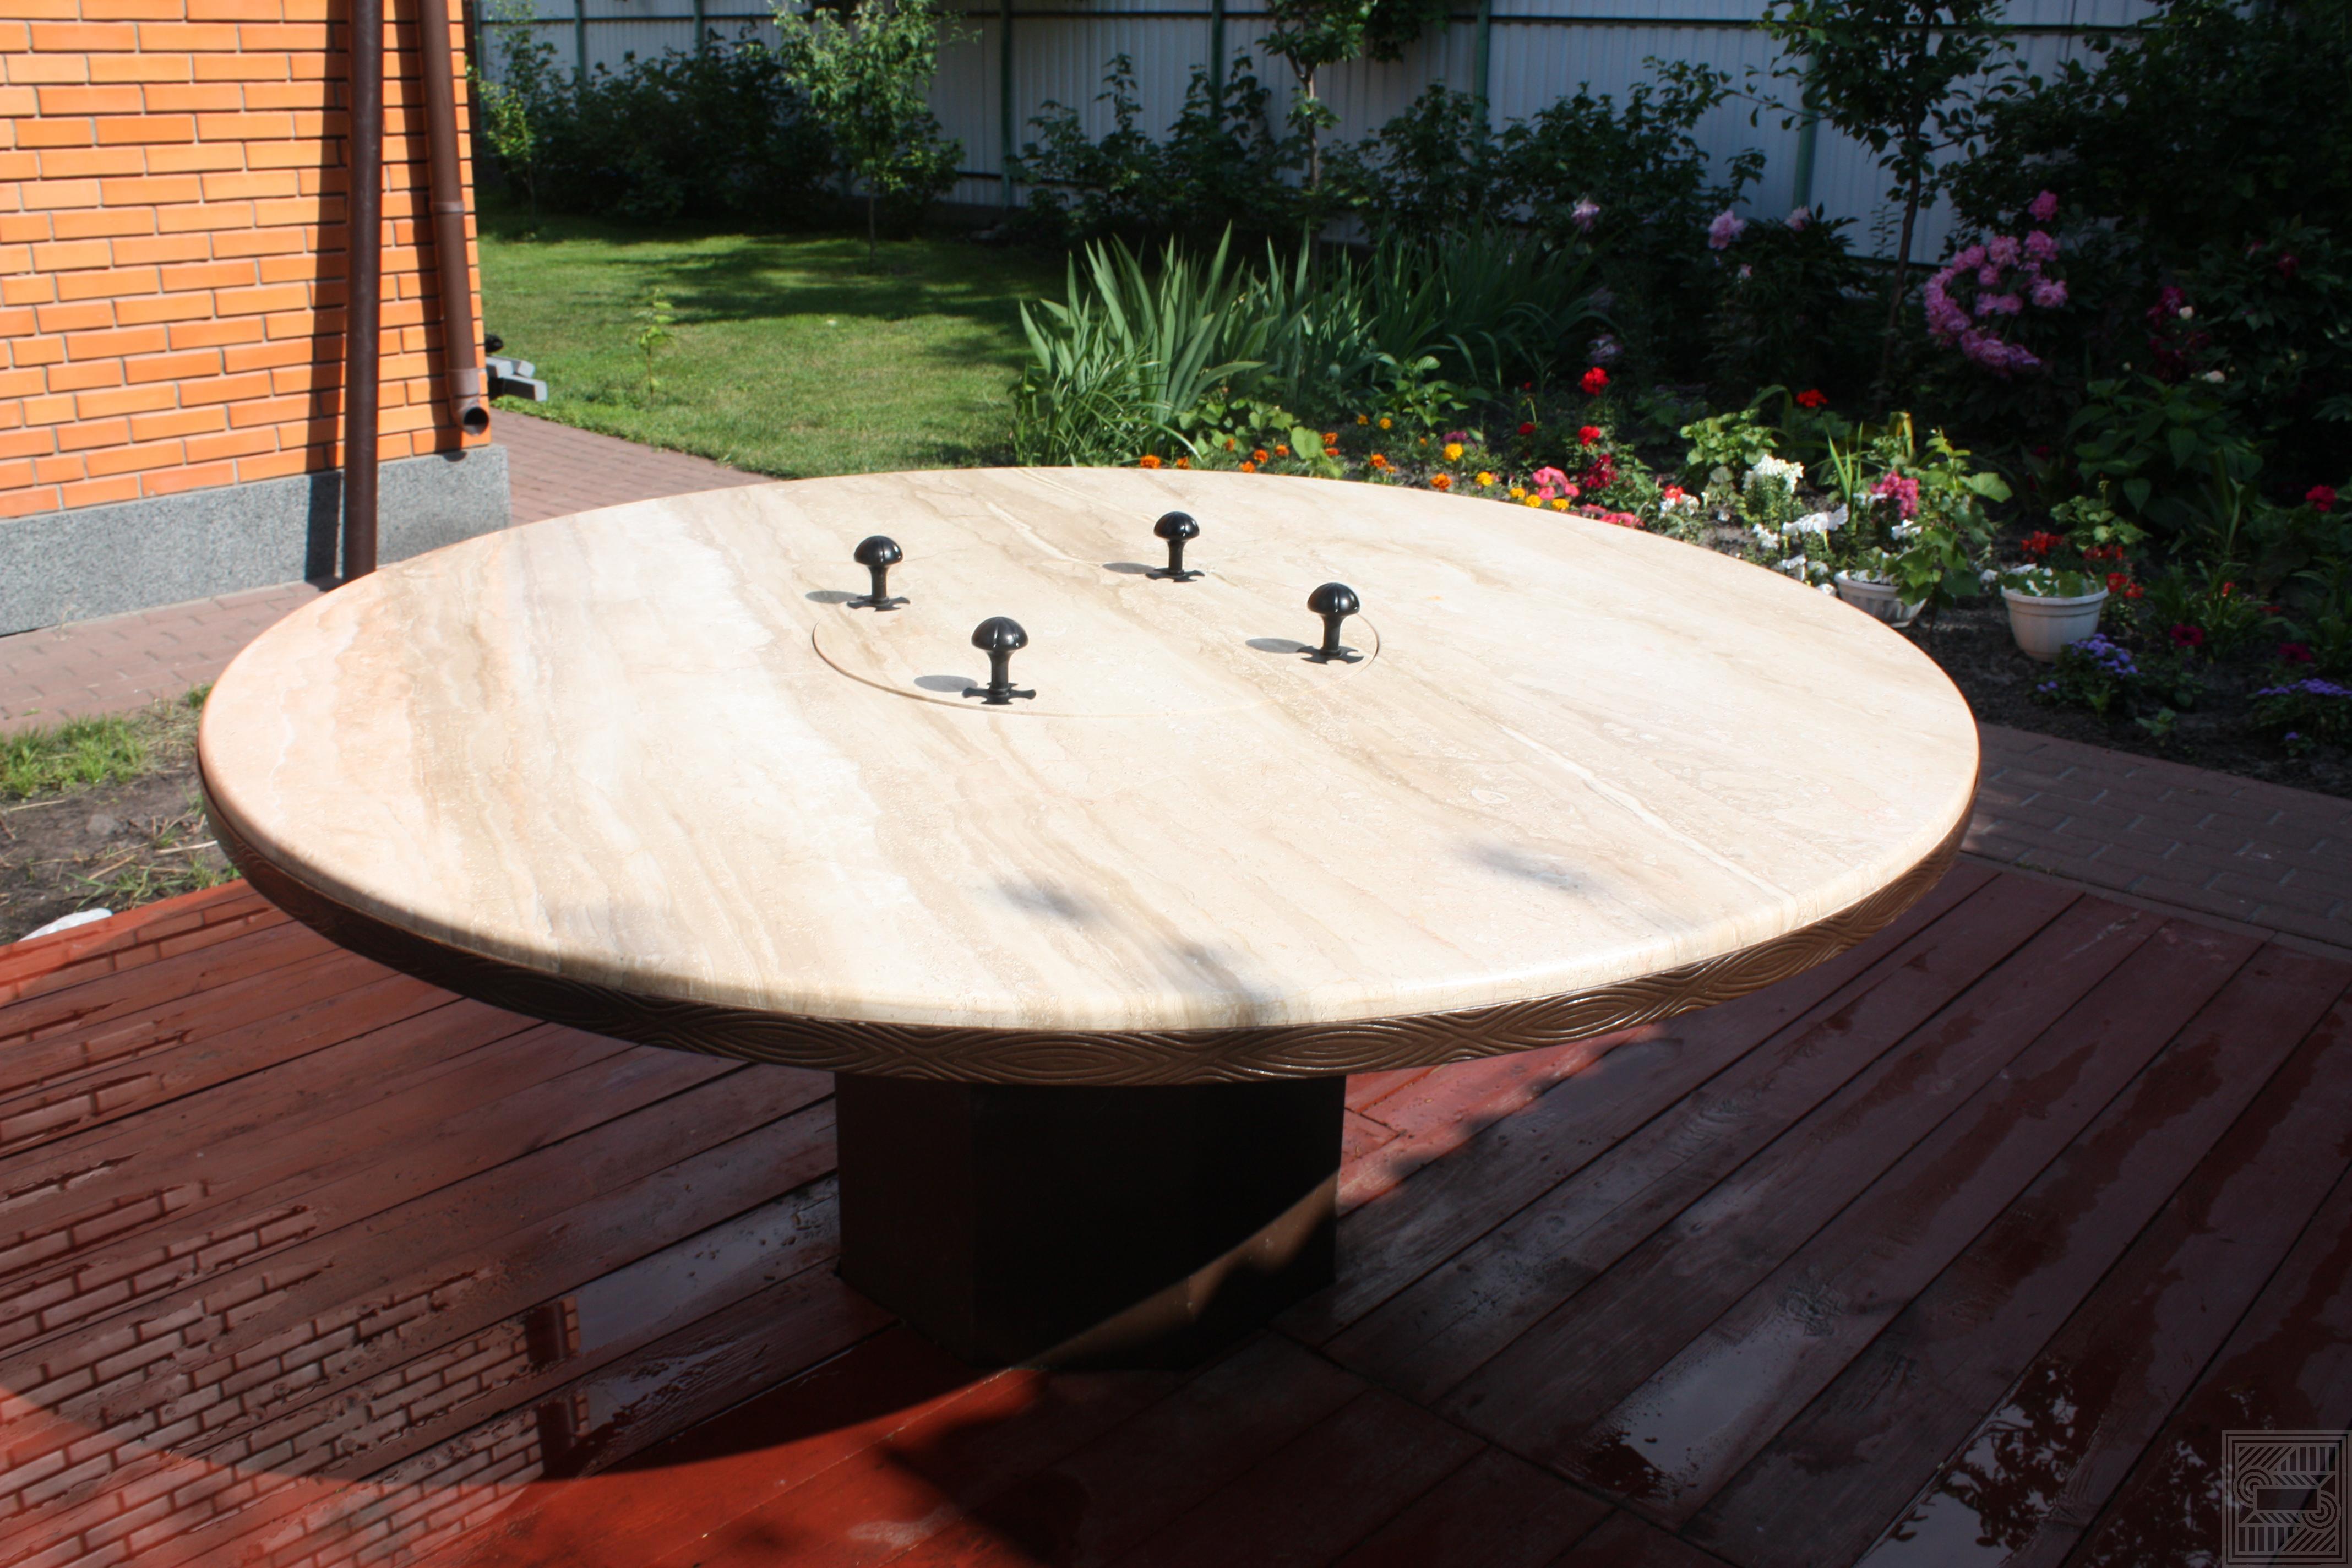 Стол-мангал диаметром 1800 мм из мрамора Daino 30 мм furniture - Stol mongal diametrom 1800 mm iz mramora Daino 30 mm 2